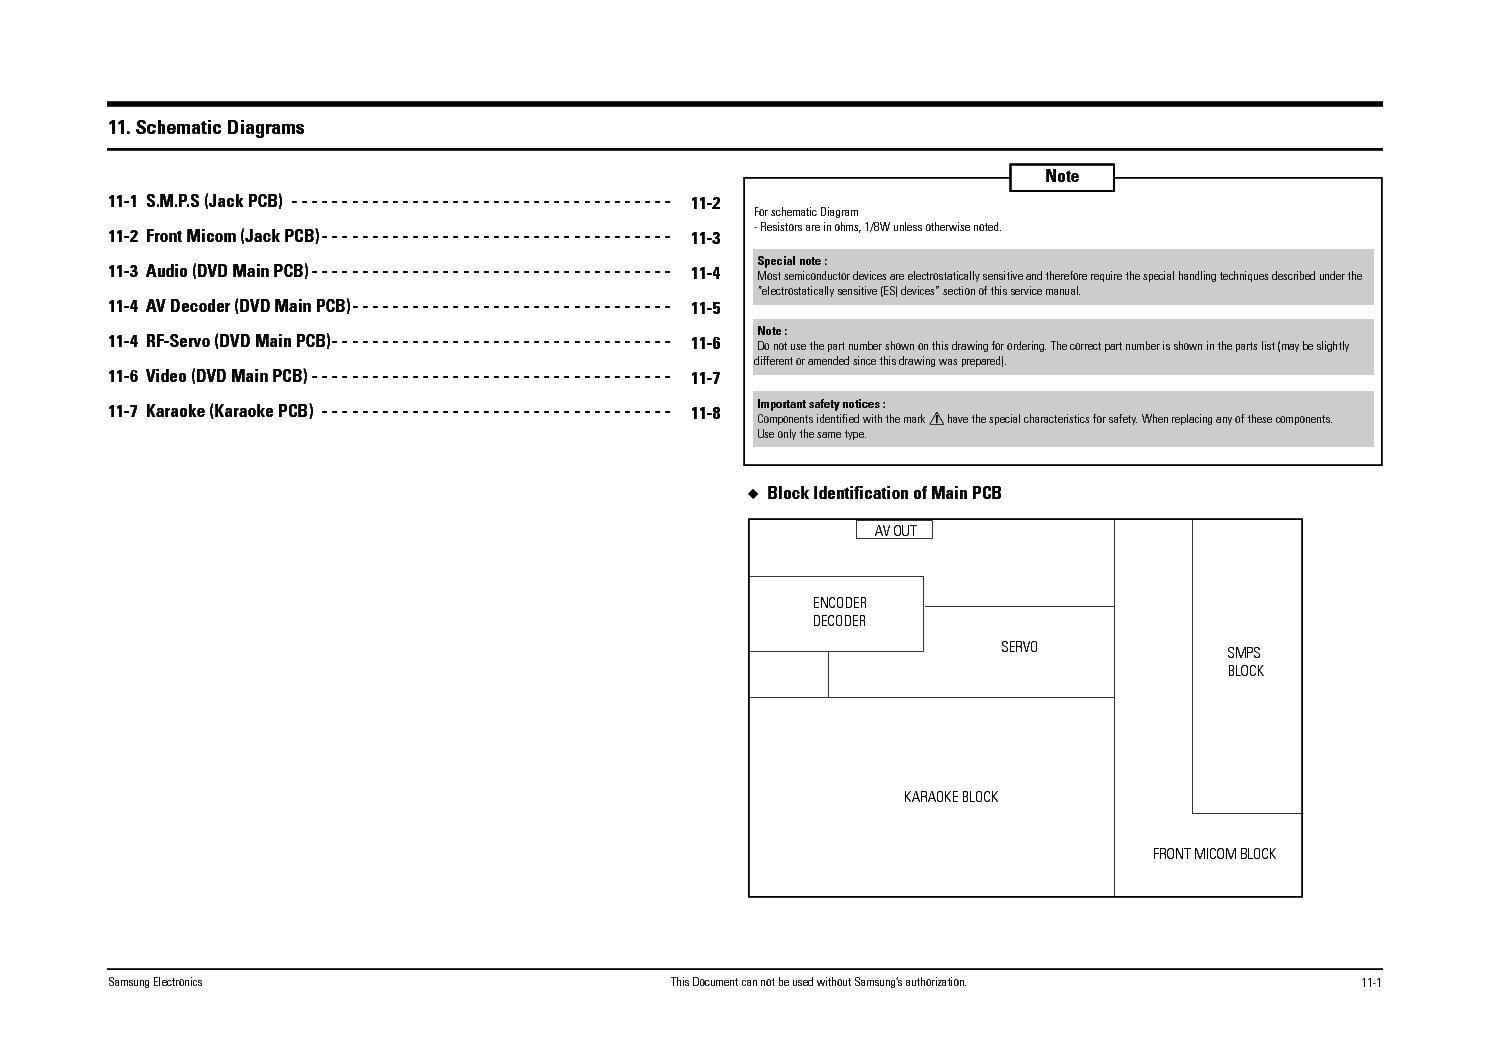 samsung note 8 manual pdf download